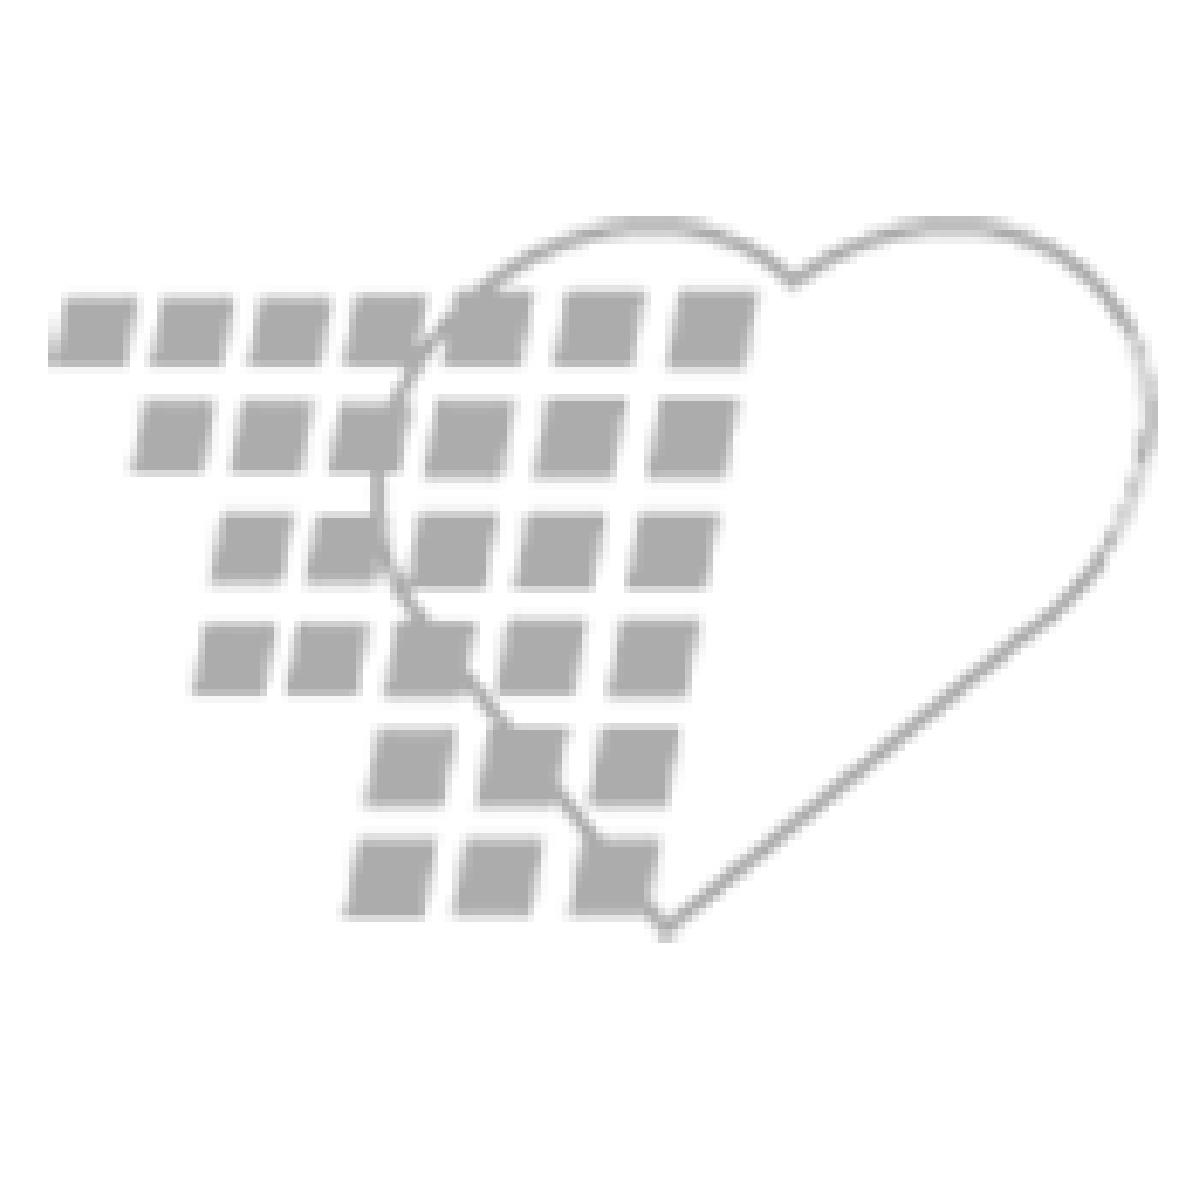 06-93-6102 - Demo Dose® Simulated FFP B Rh Negative